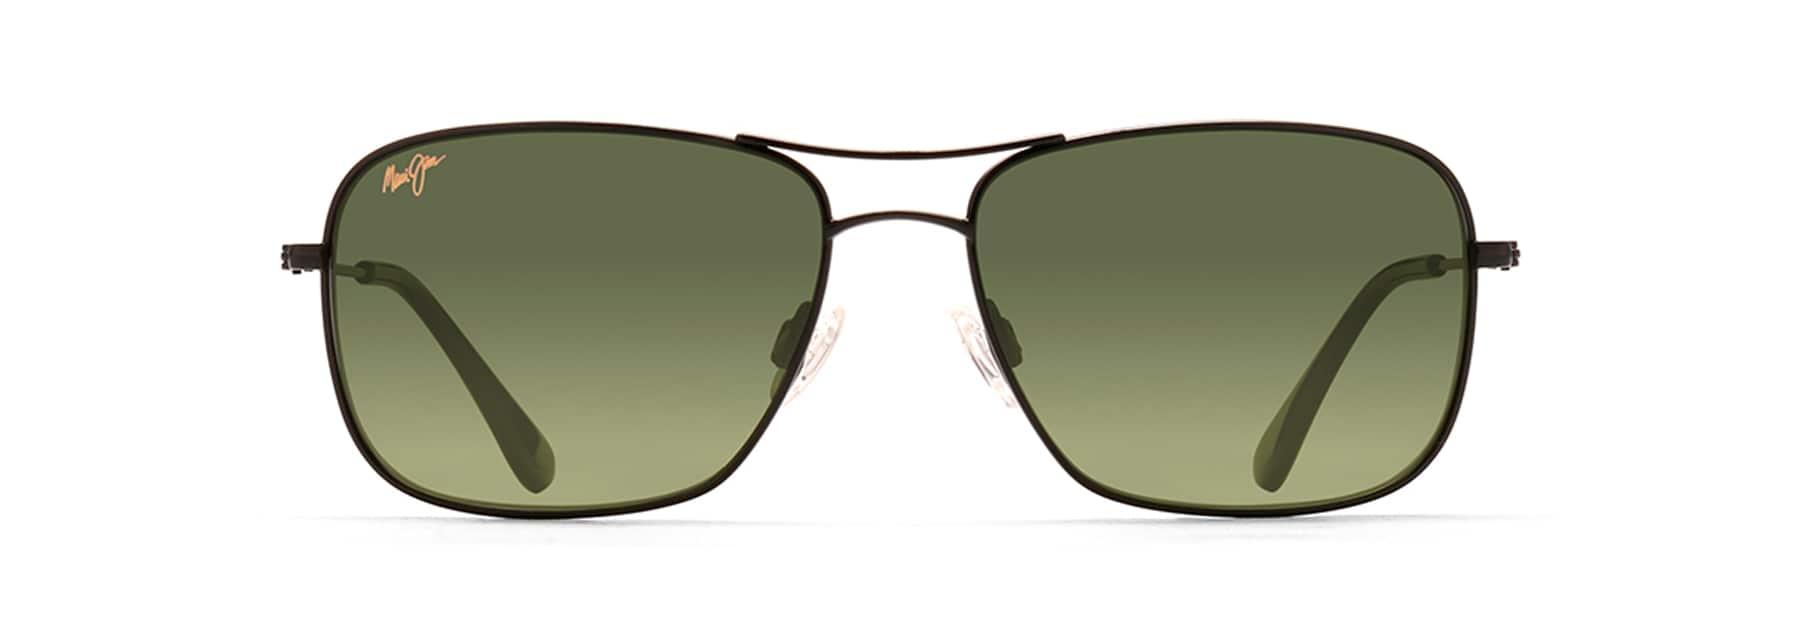 896206c179d2 Wiki Wiki Polarized Sunglasses | Maui Jim®